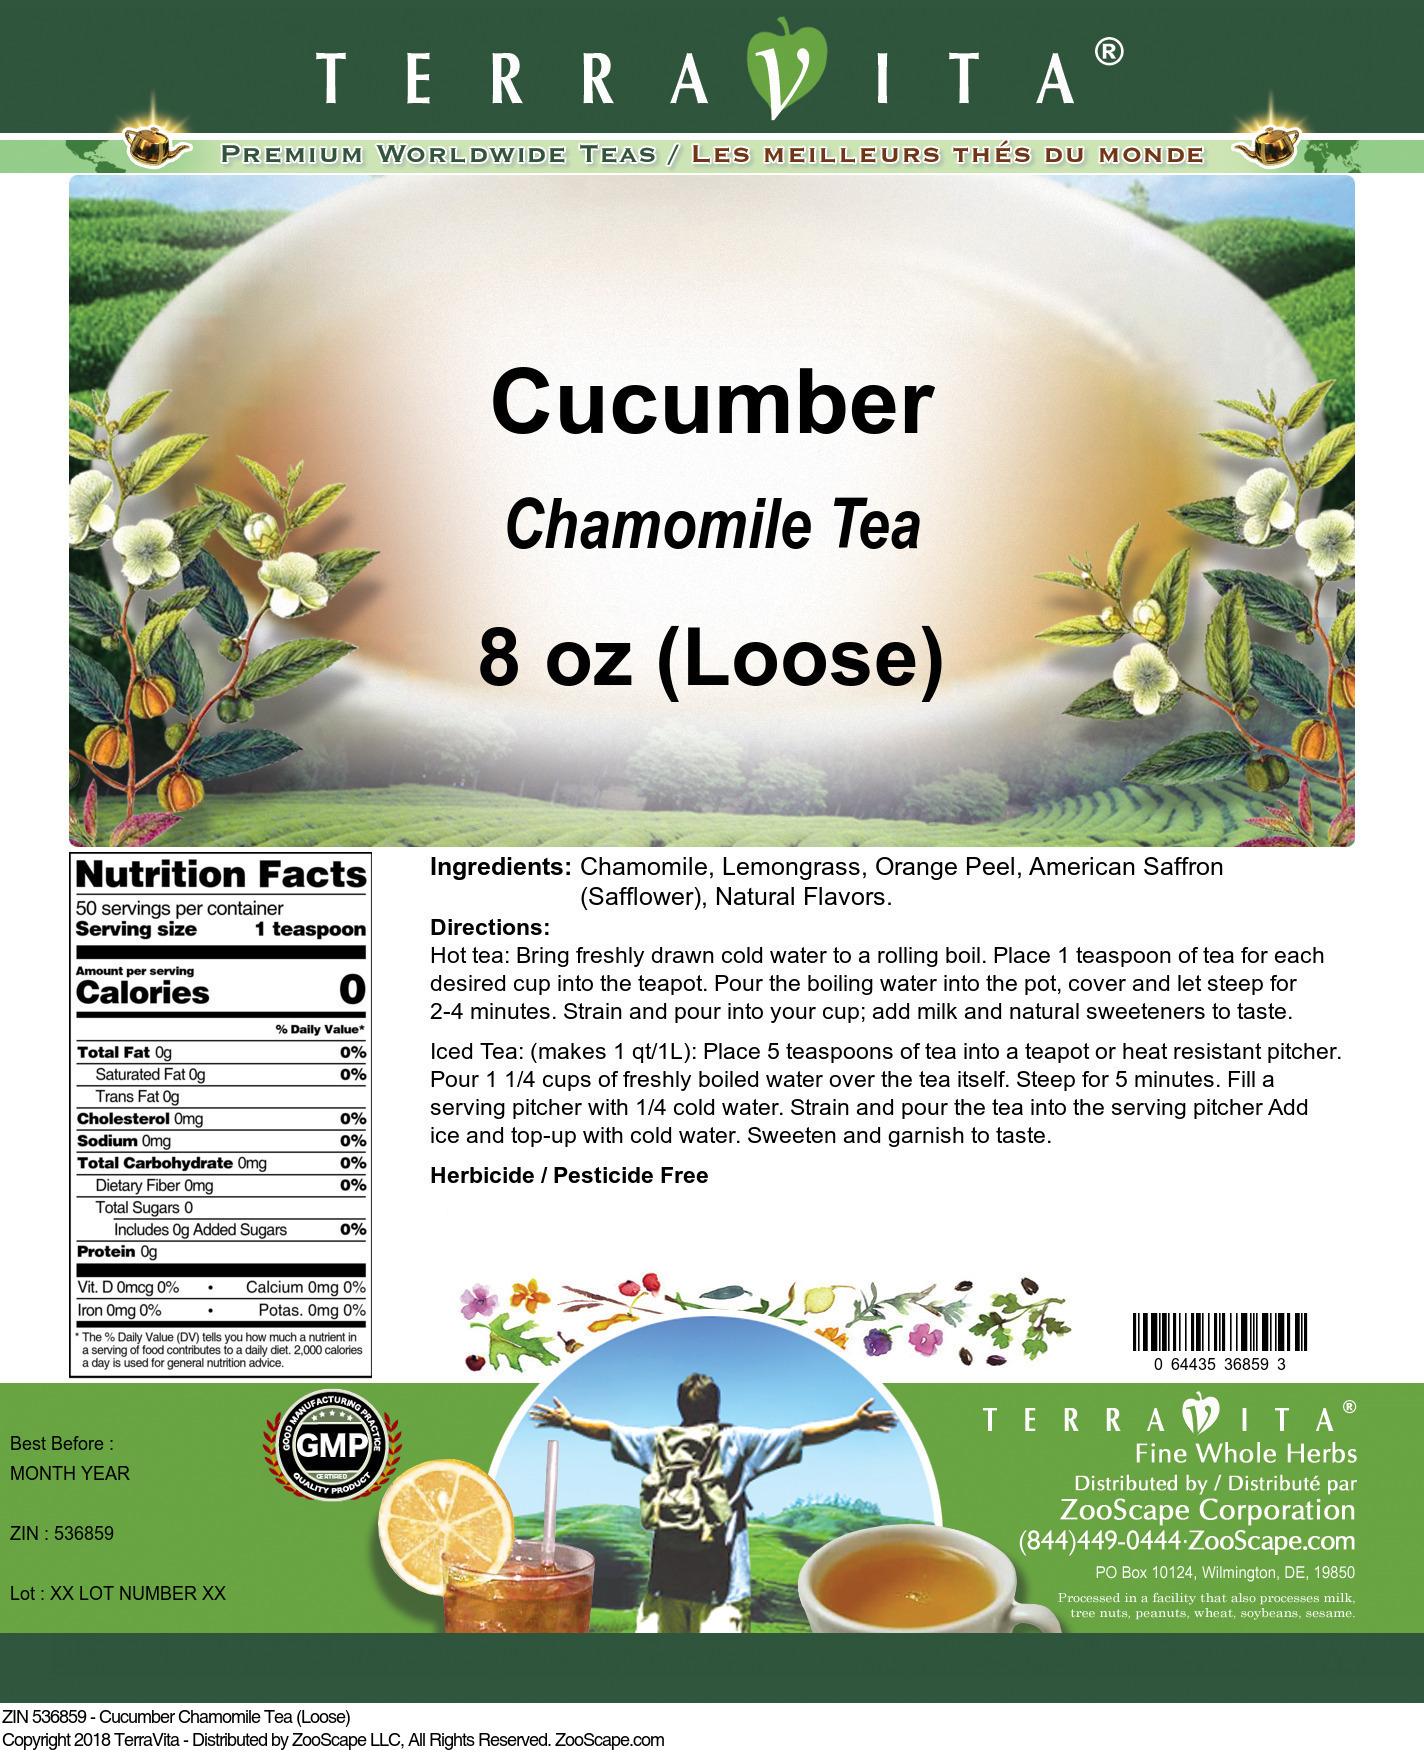 Cucumber Chamomile Tea (Loose)